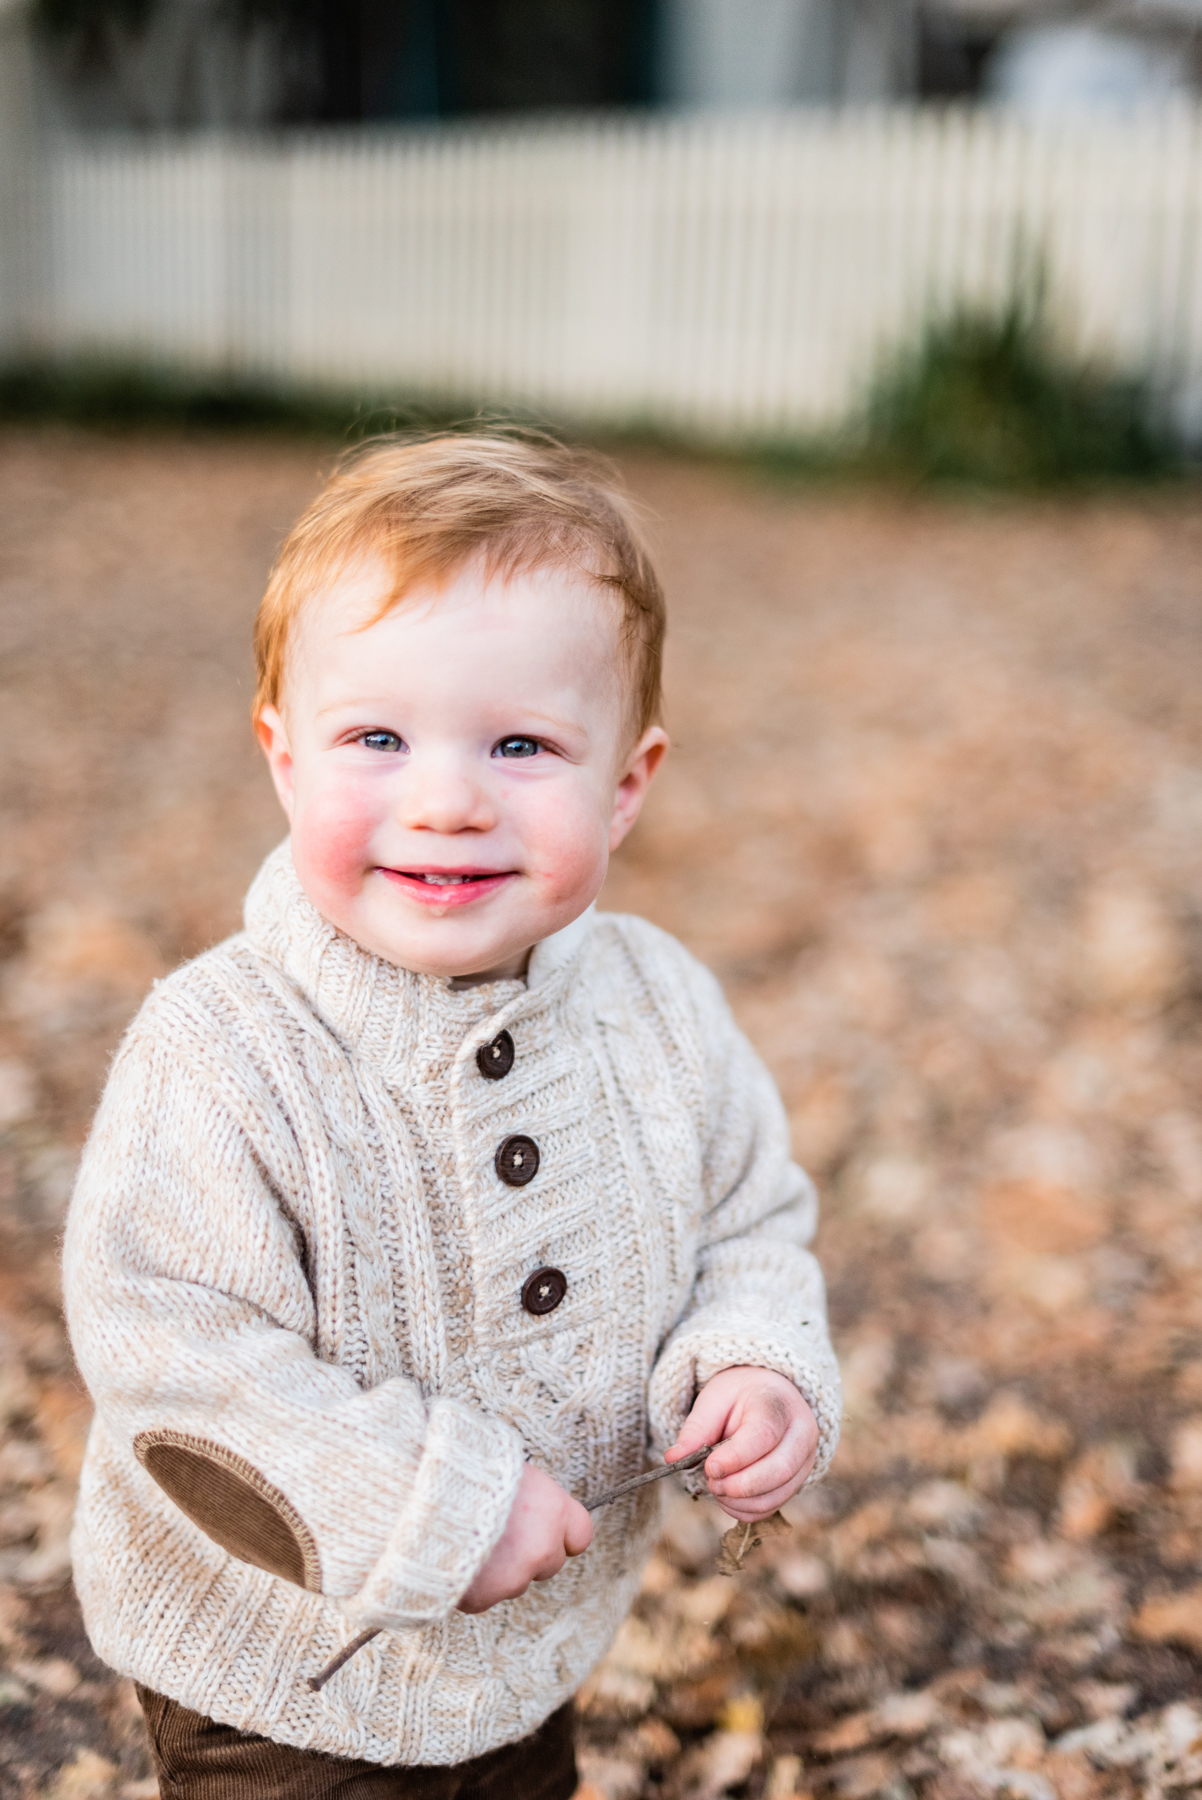 Toddler portrait session at Hap Magee Park.